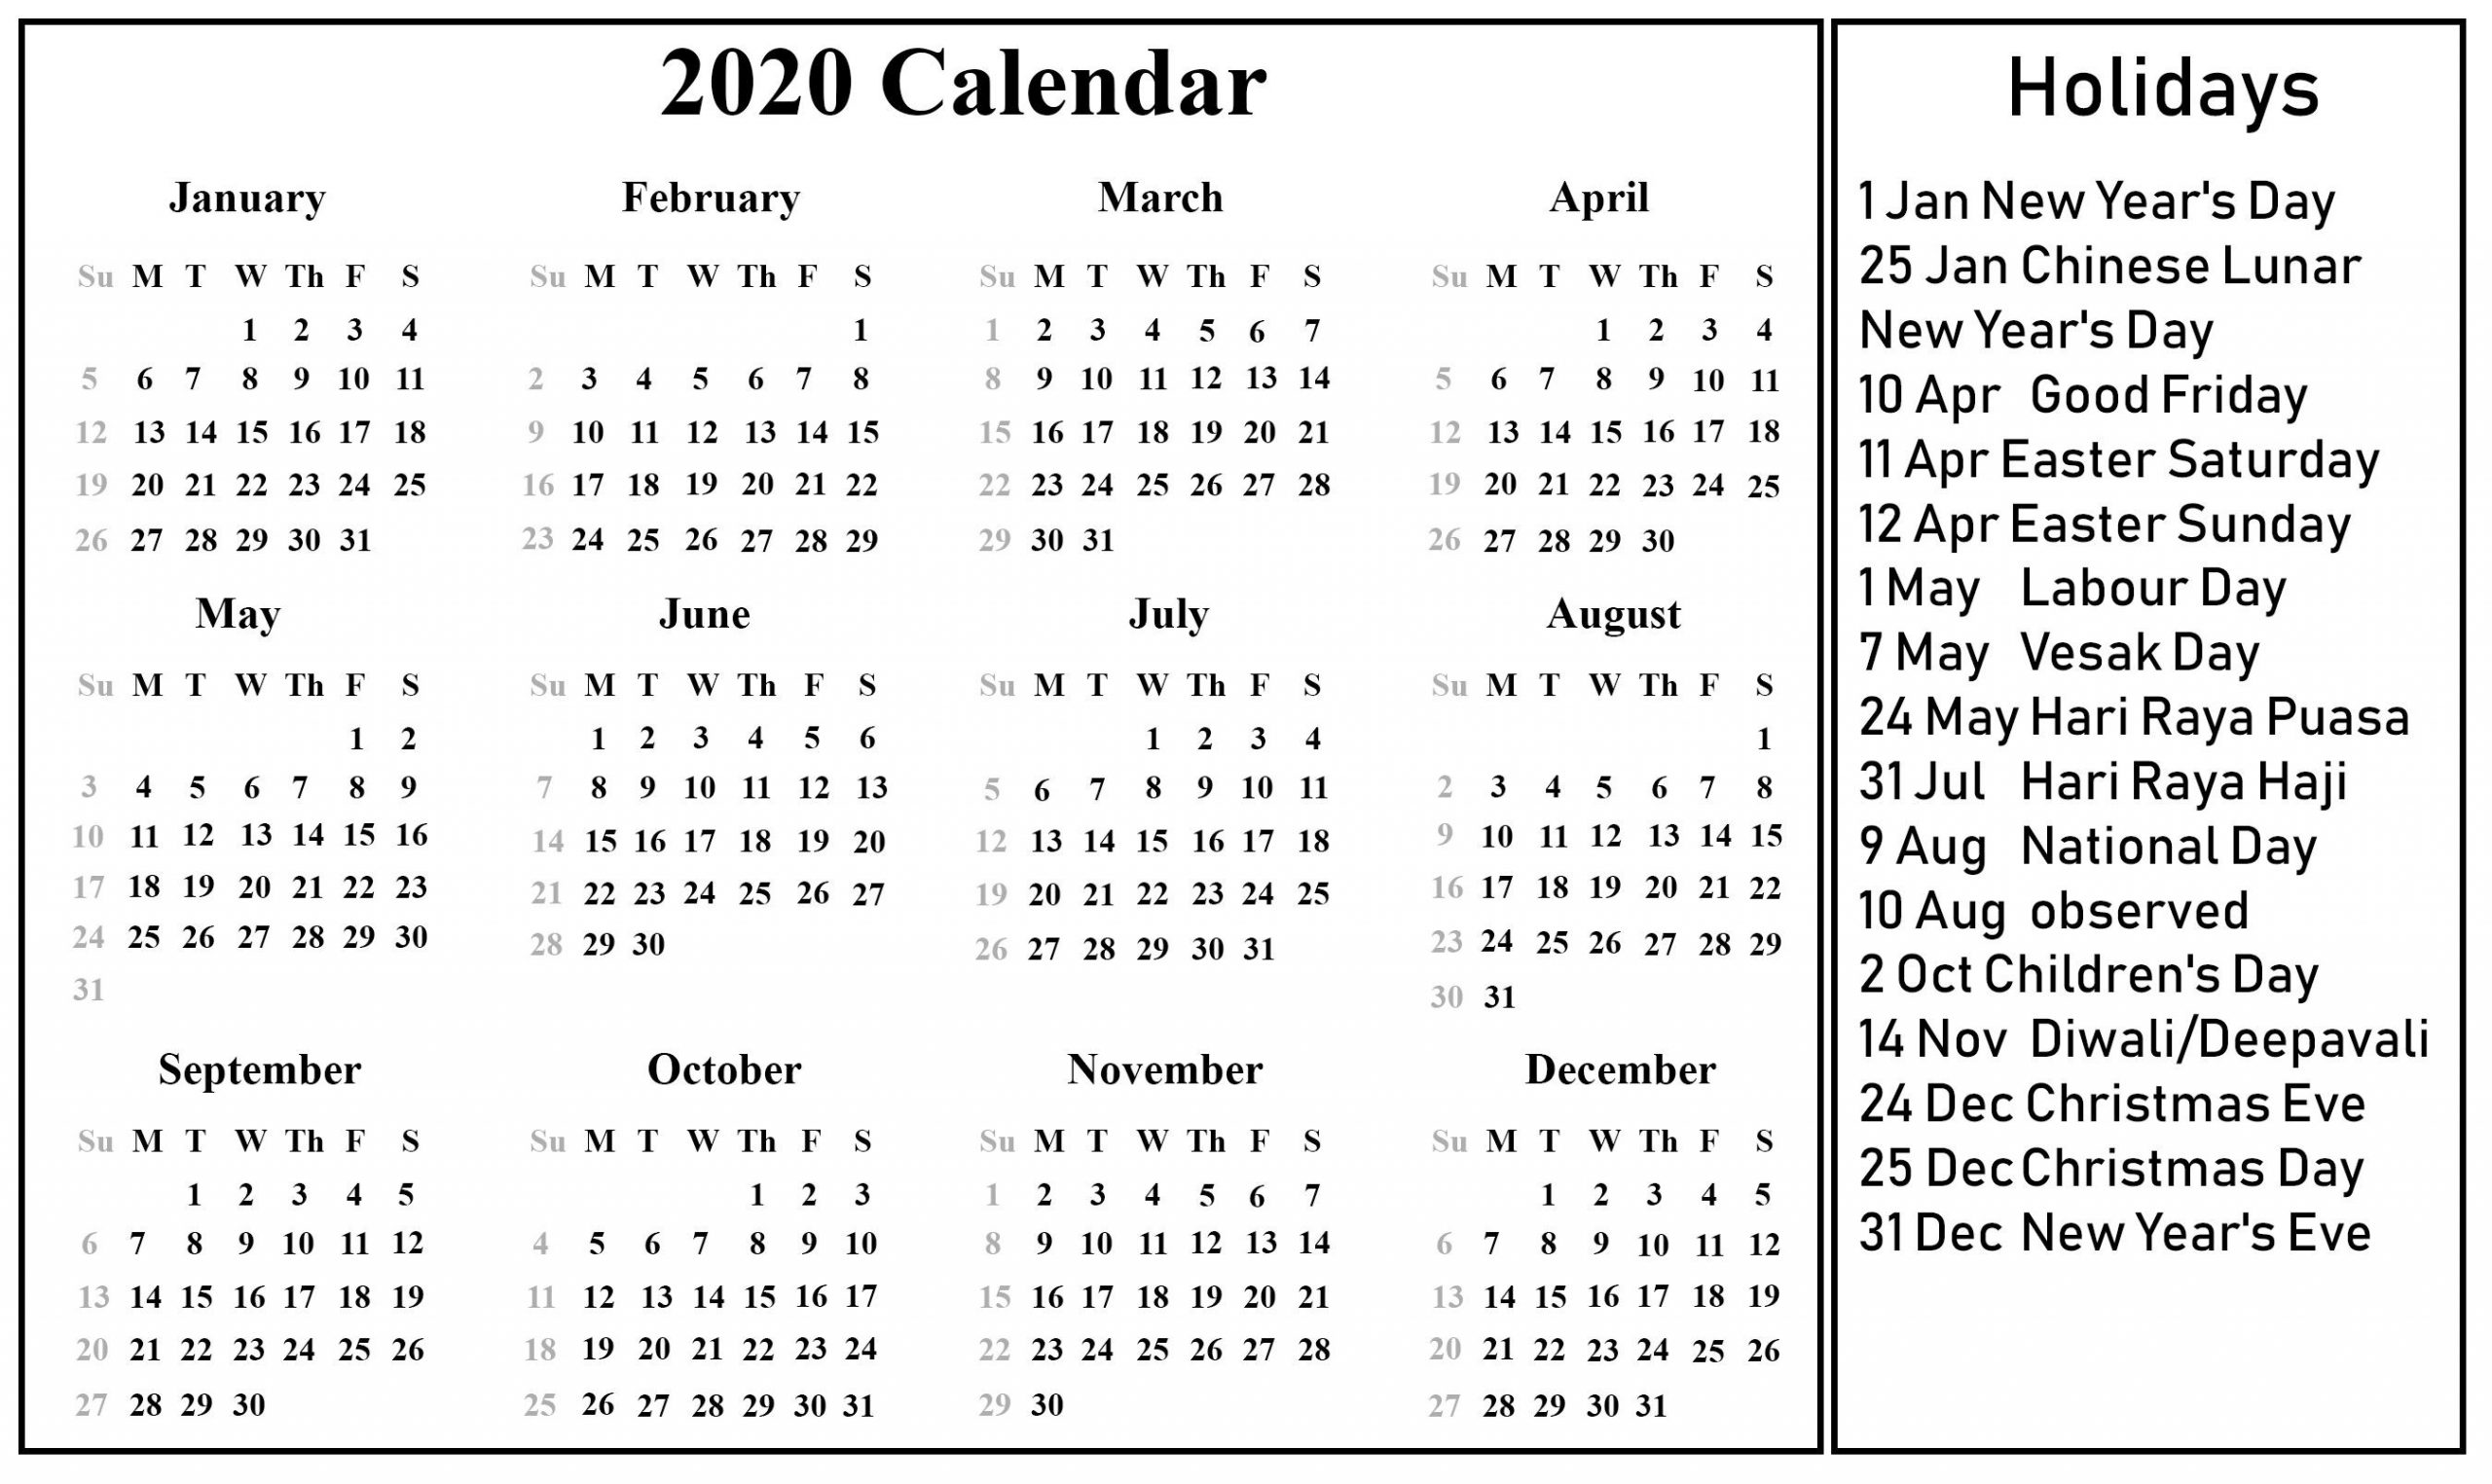 Impressive 2020 Calendar Holidays Sri Lanka   Holiday-Mercantile Holidays Sri Lanka 2021